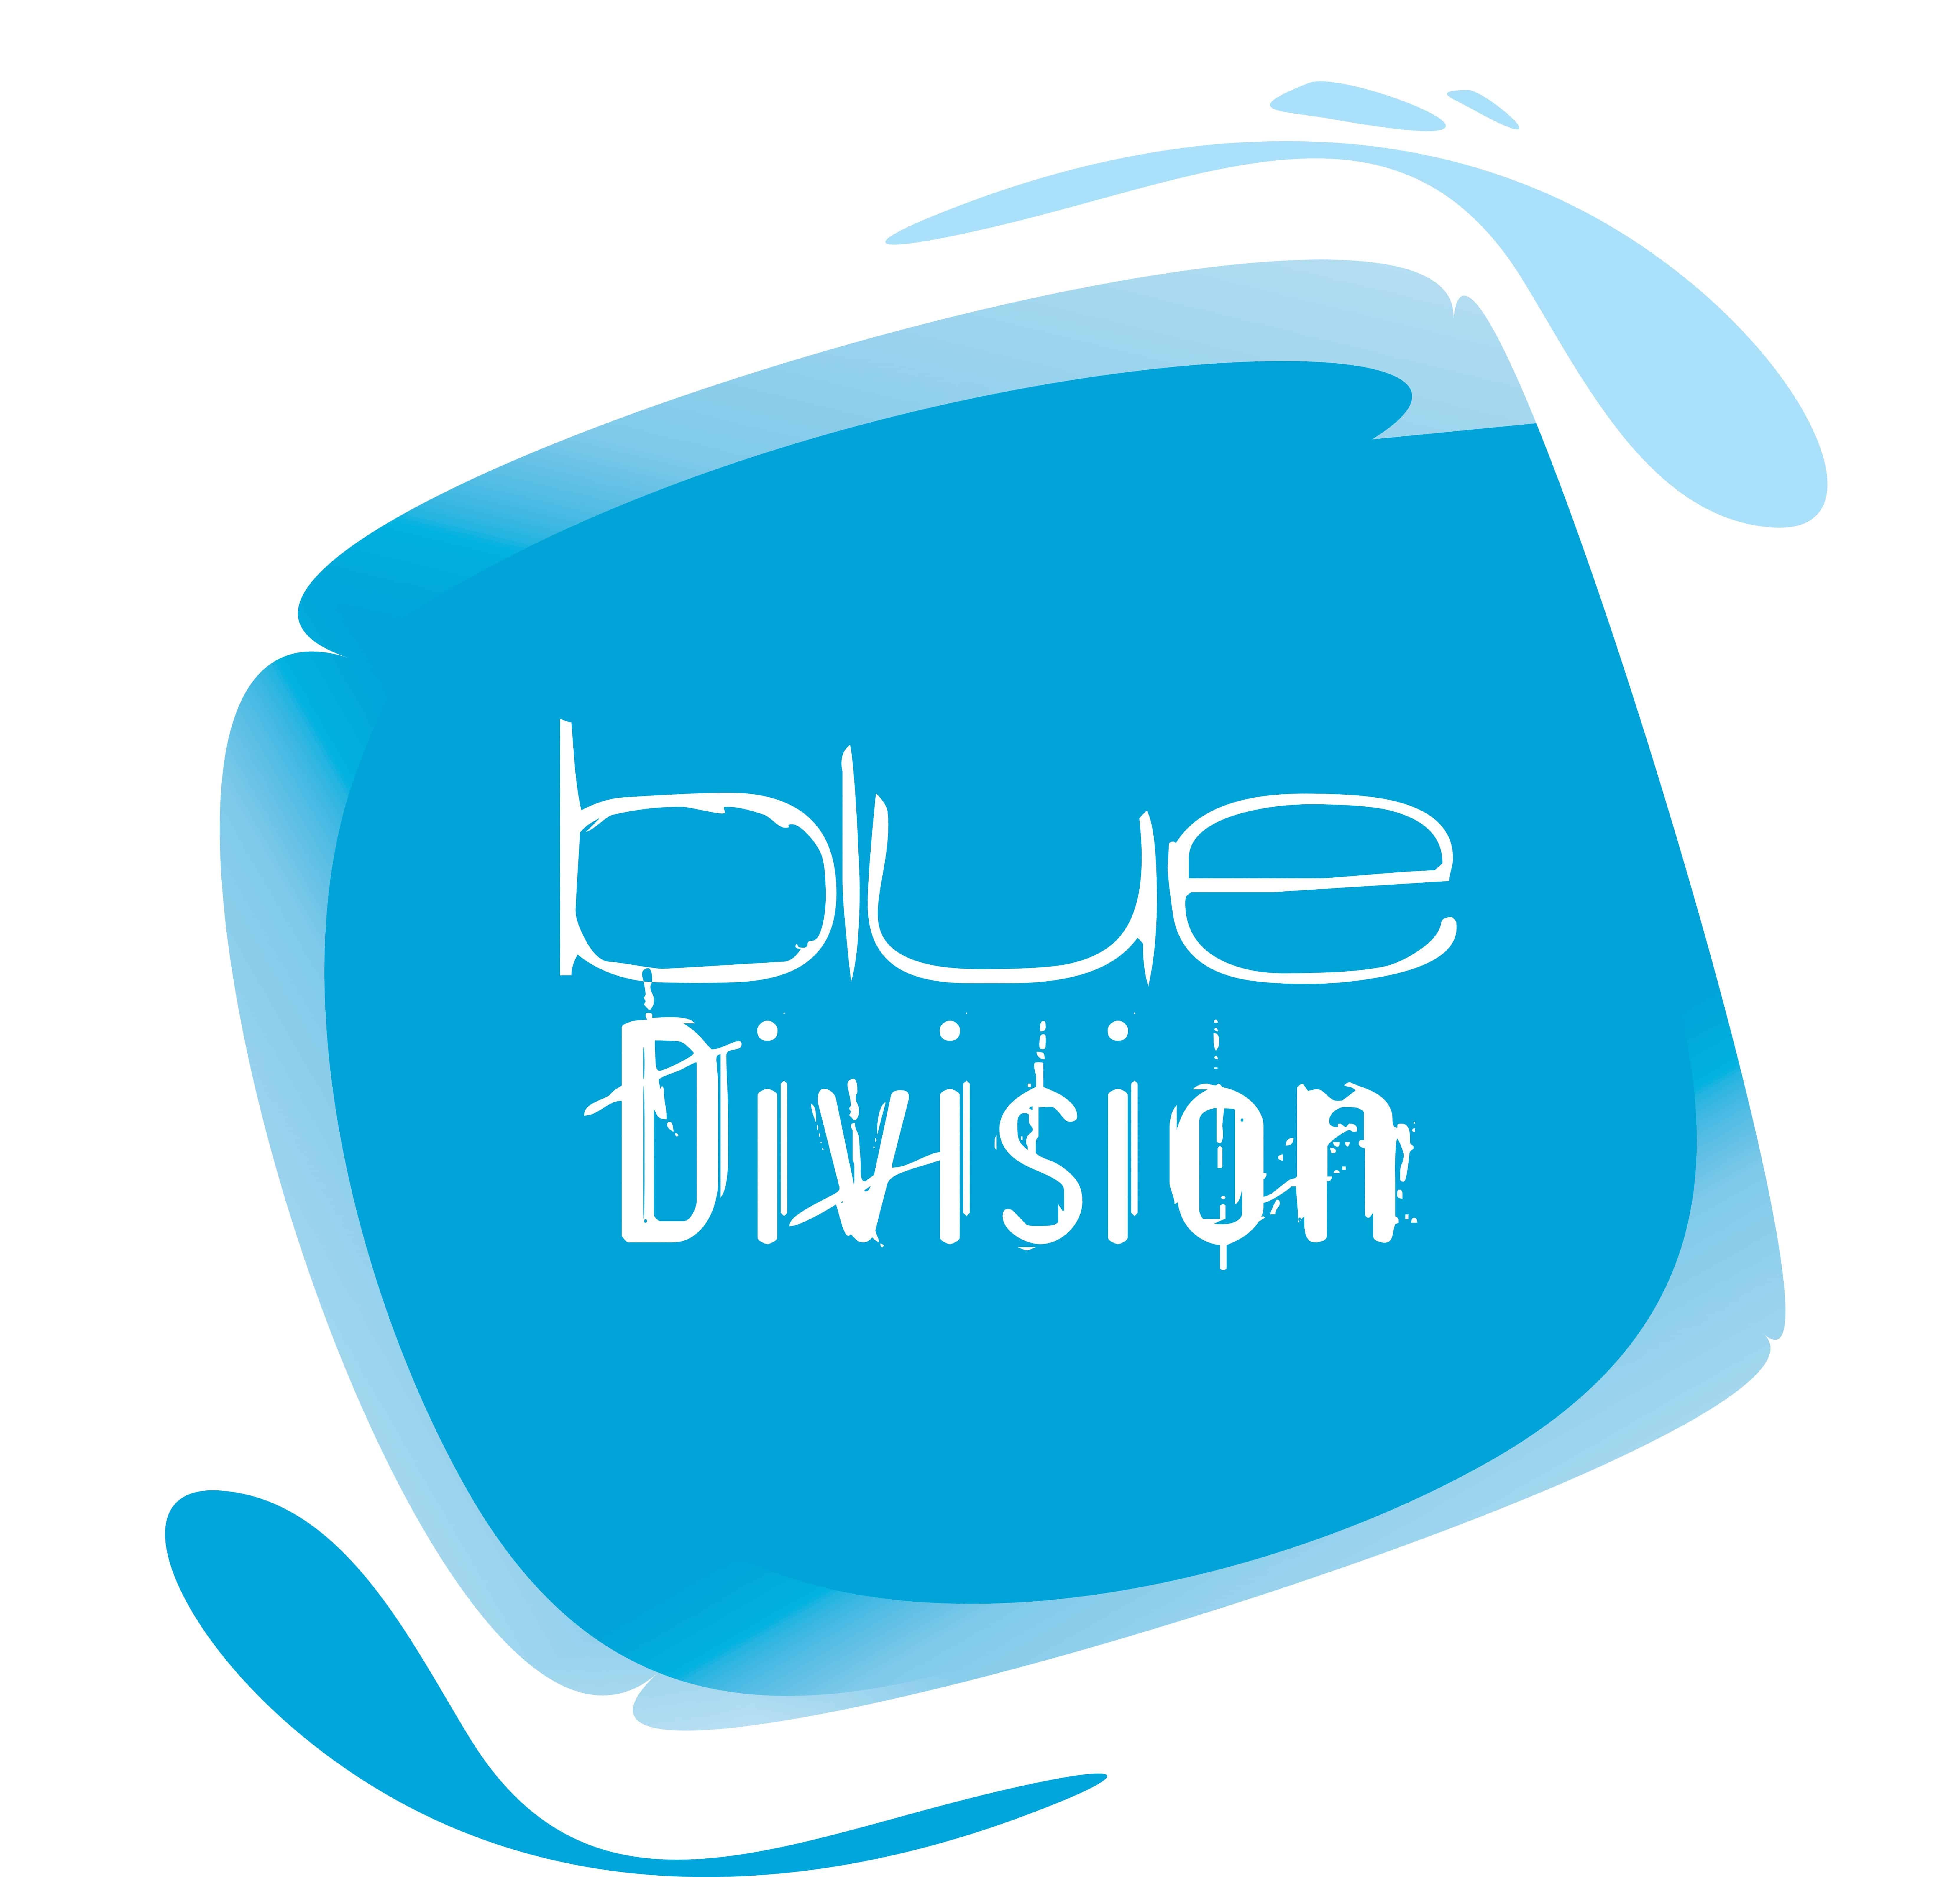 Blue Division